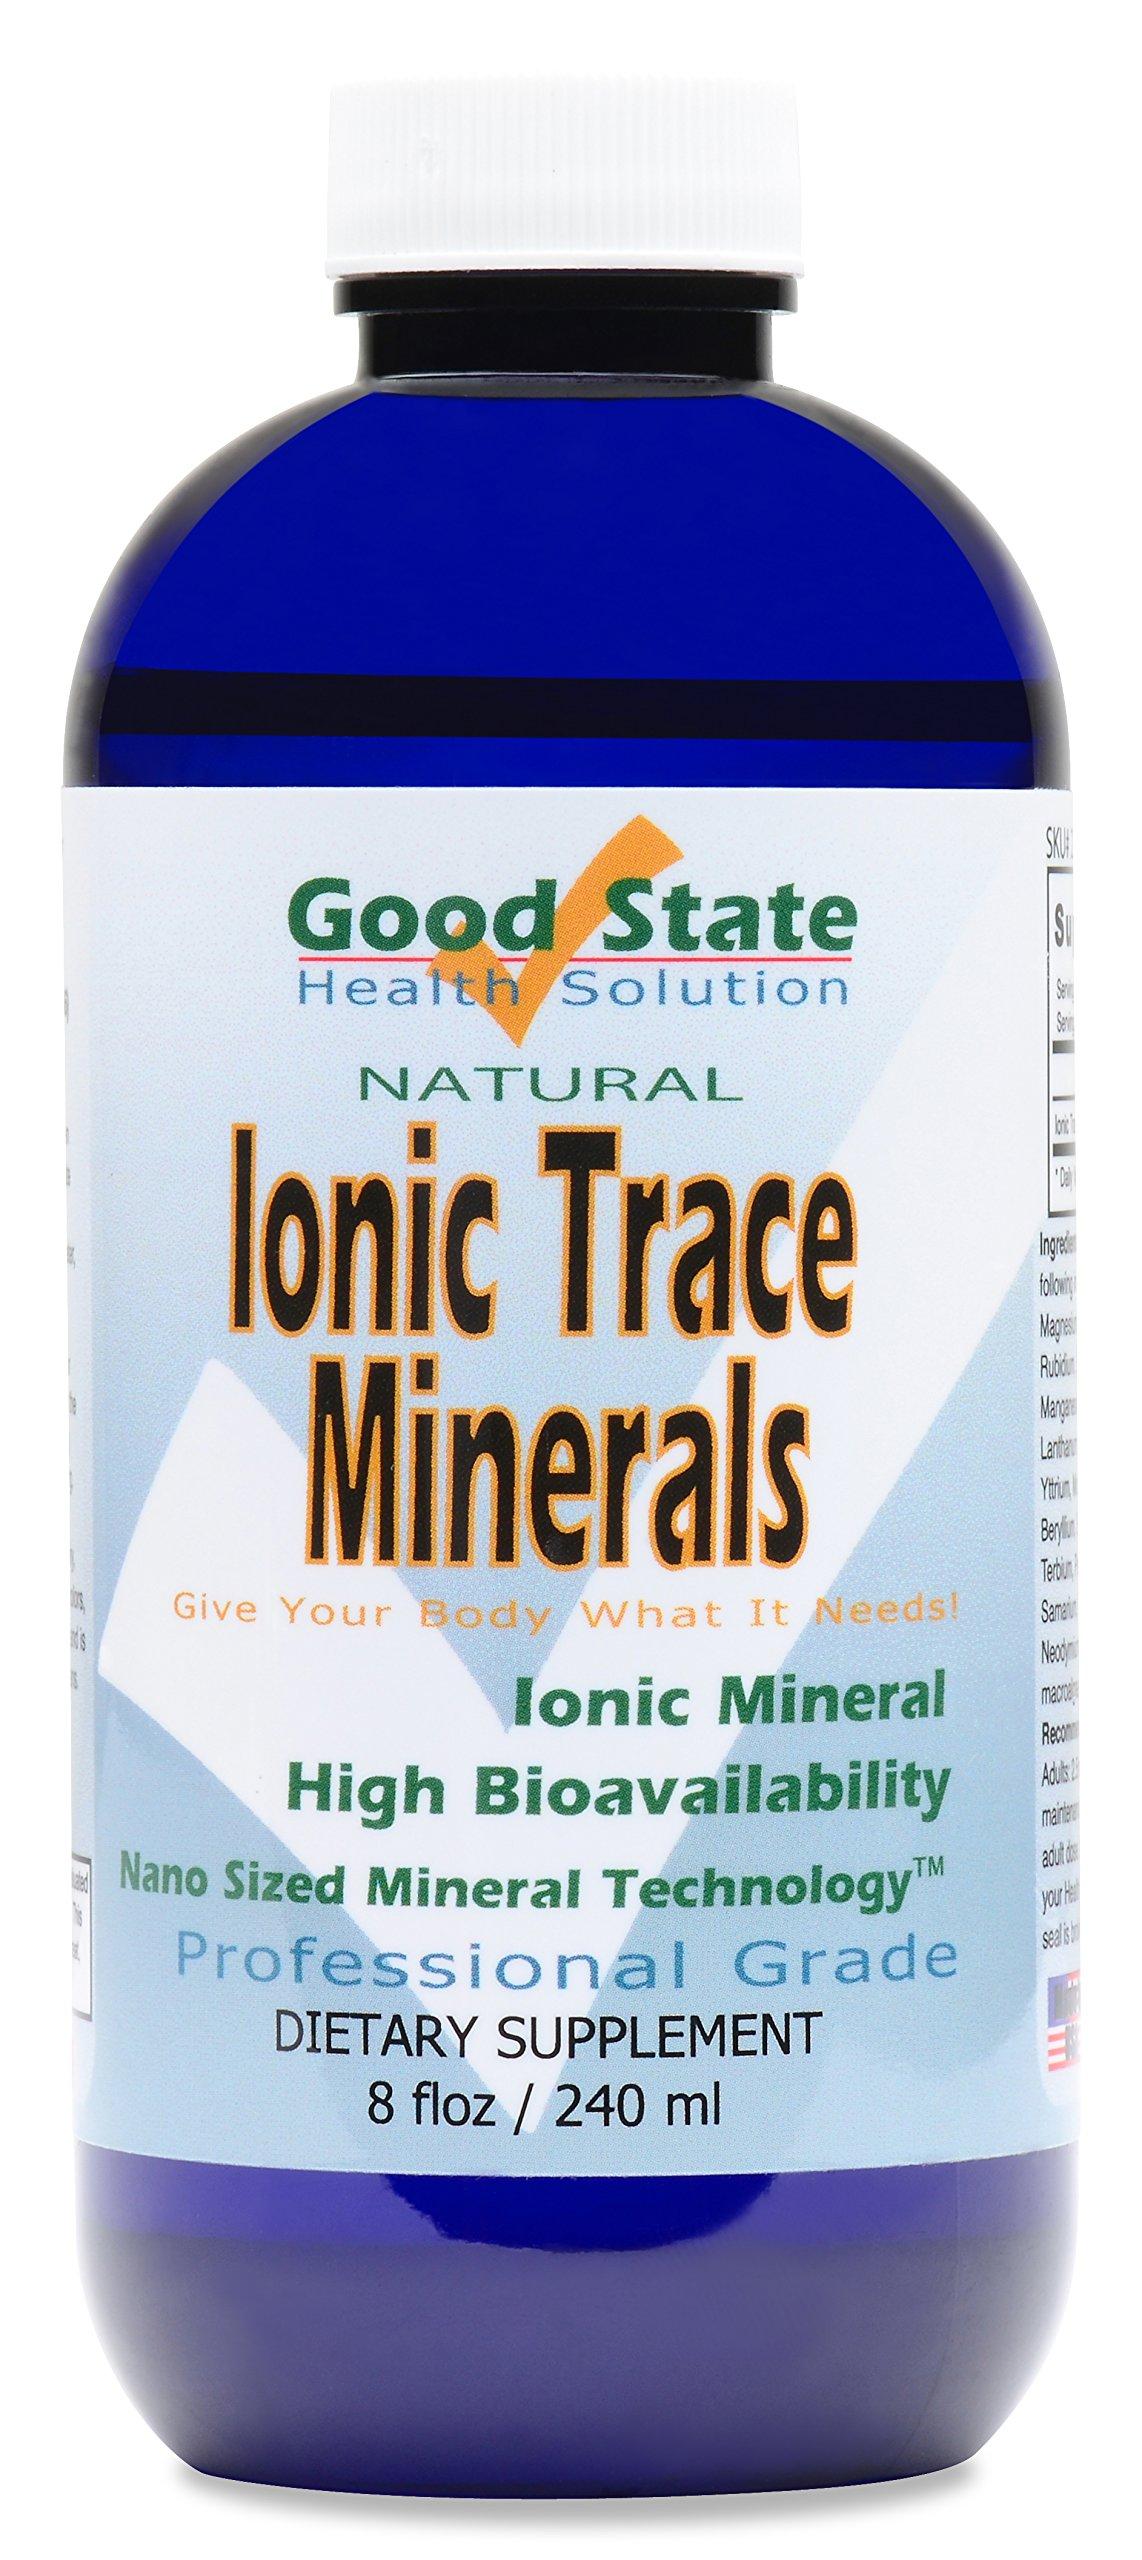 Good State Liquid Ionic Trace Minerals (96 servings at 125 mg - 8 fl oz)